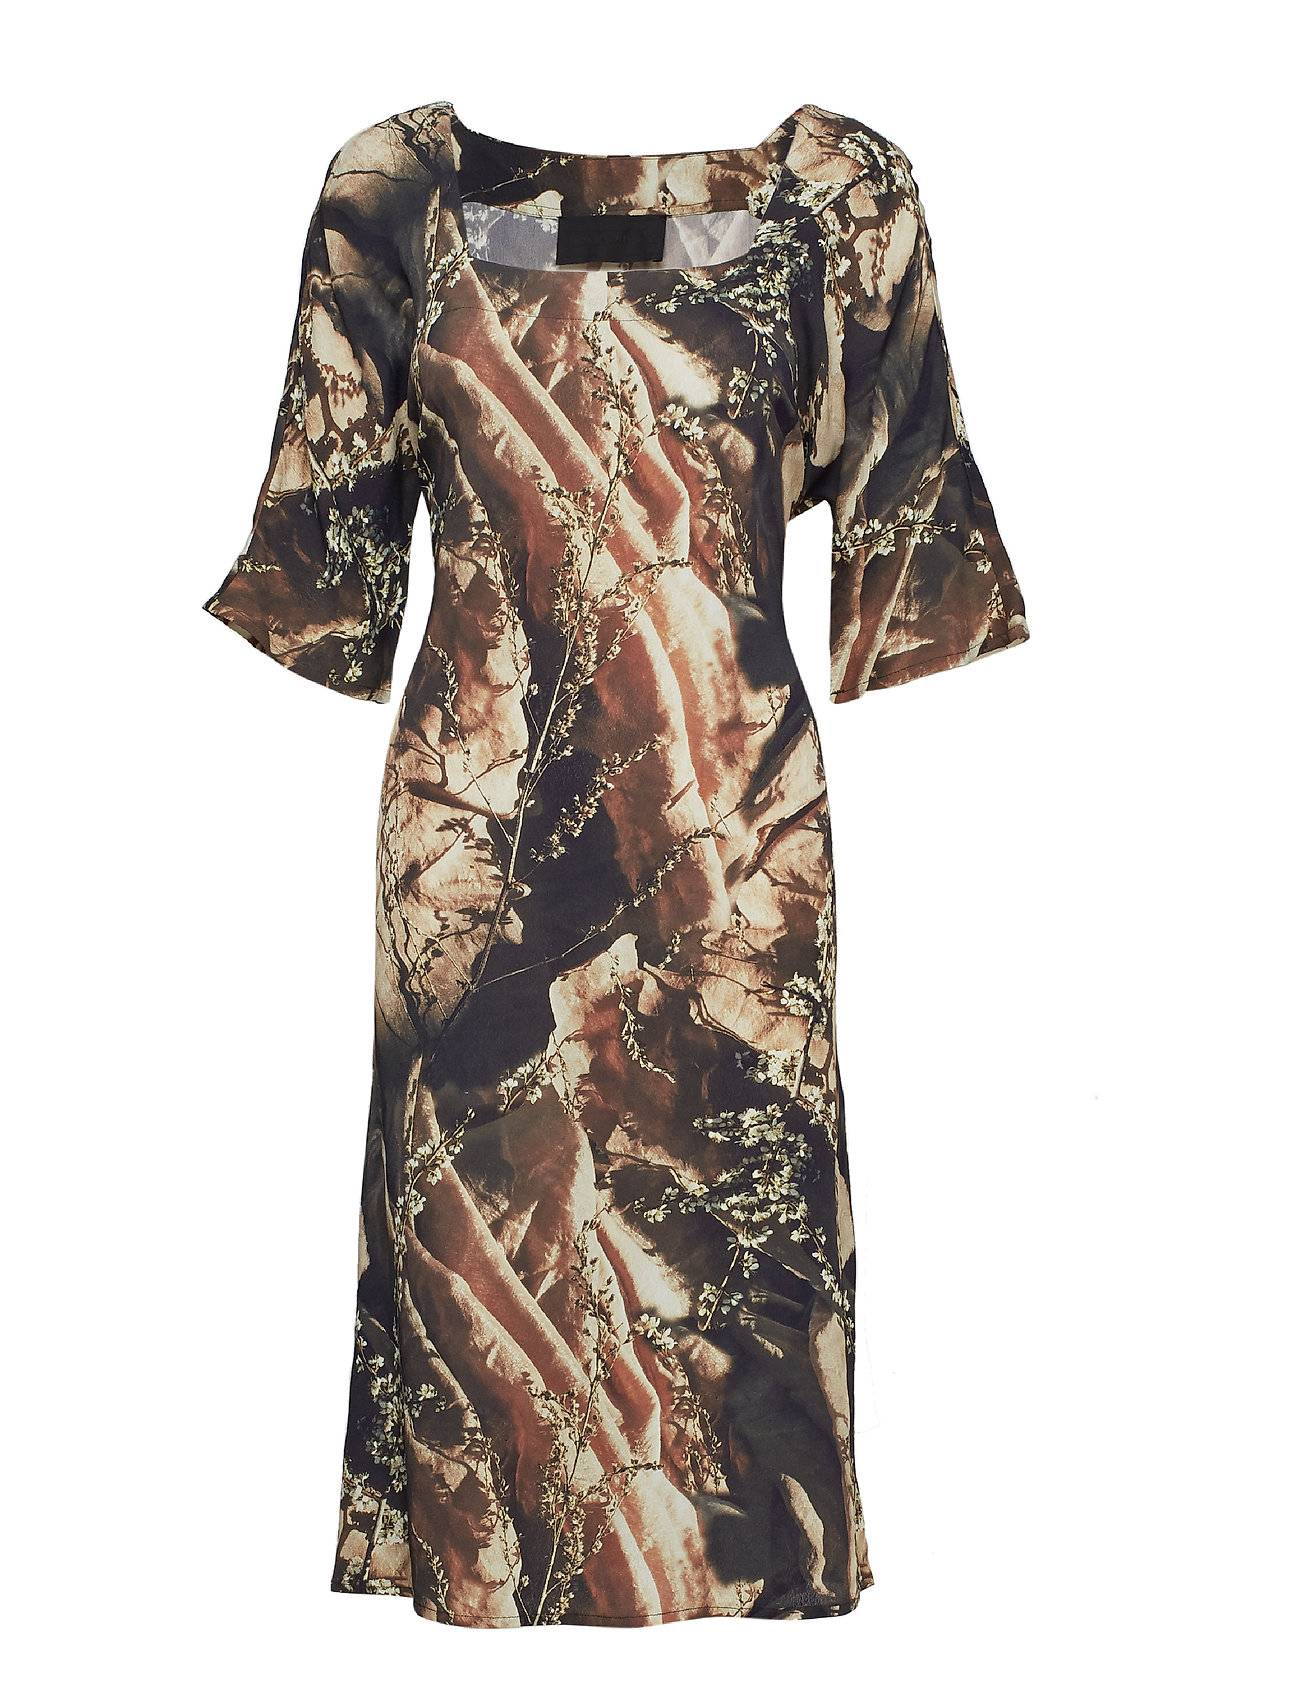 Diana Orving Square Neck Dress